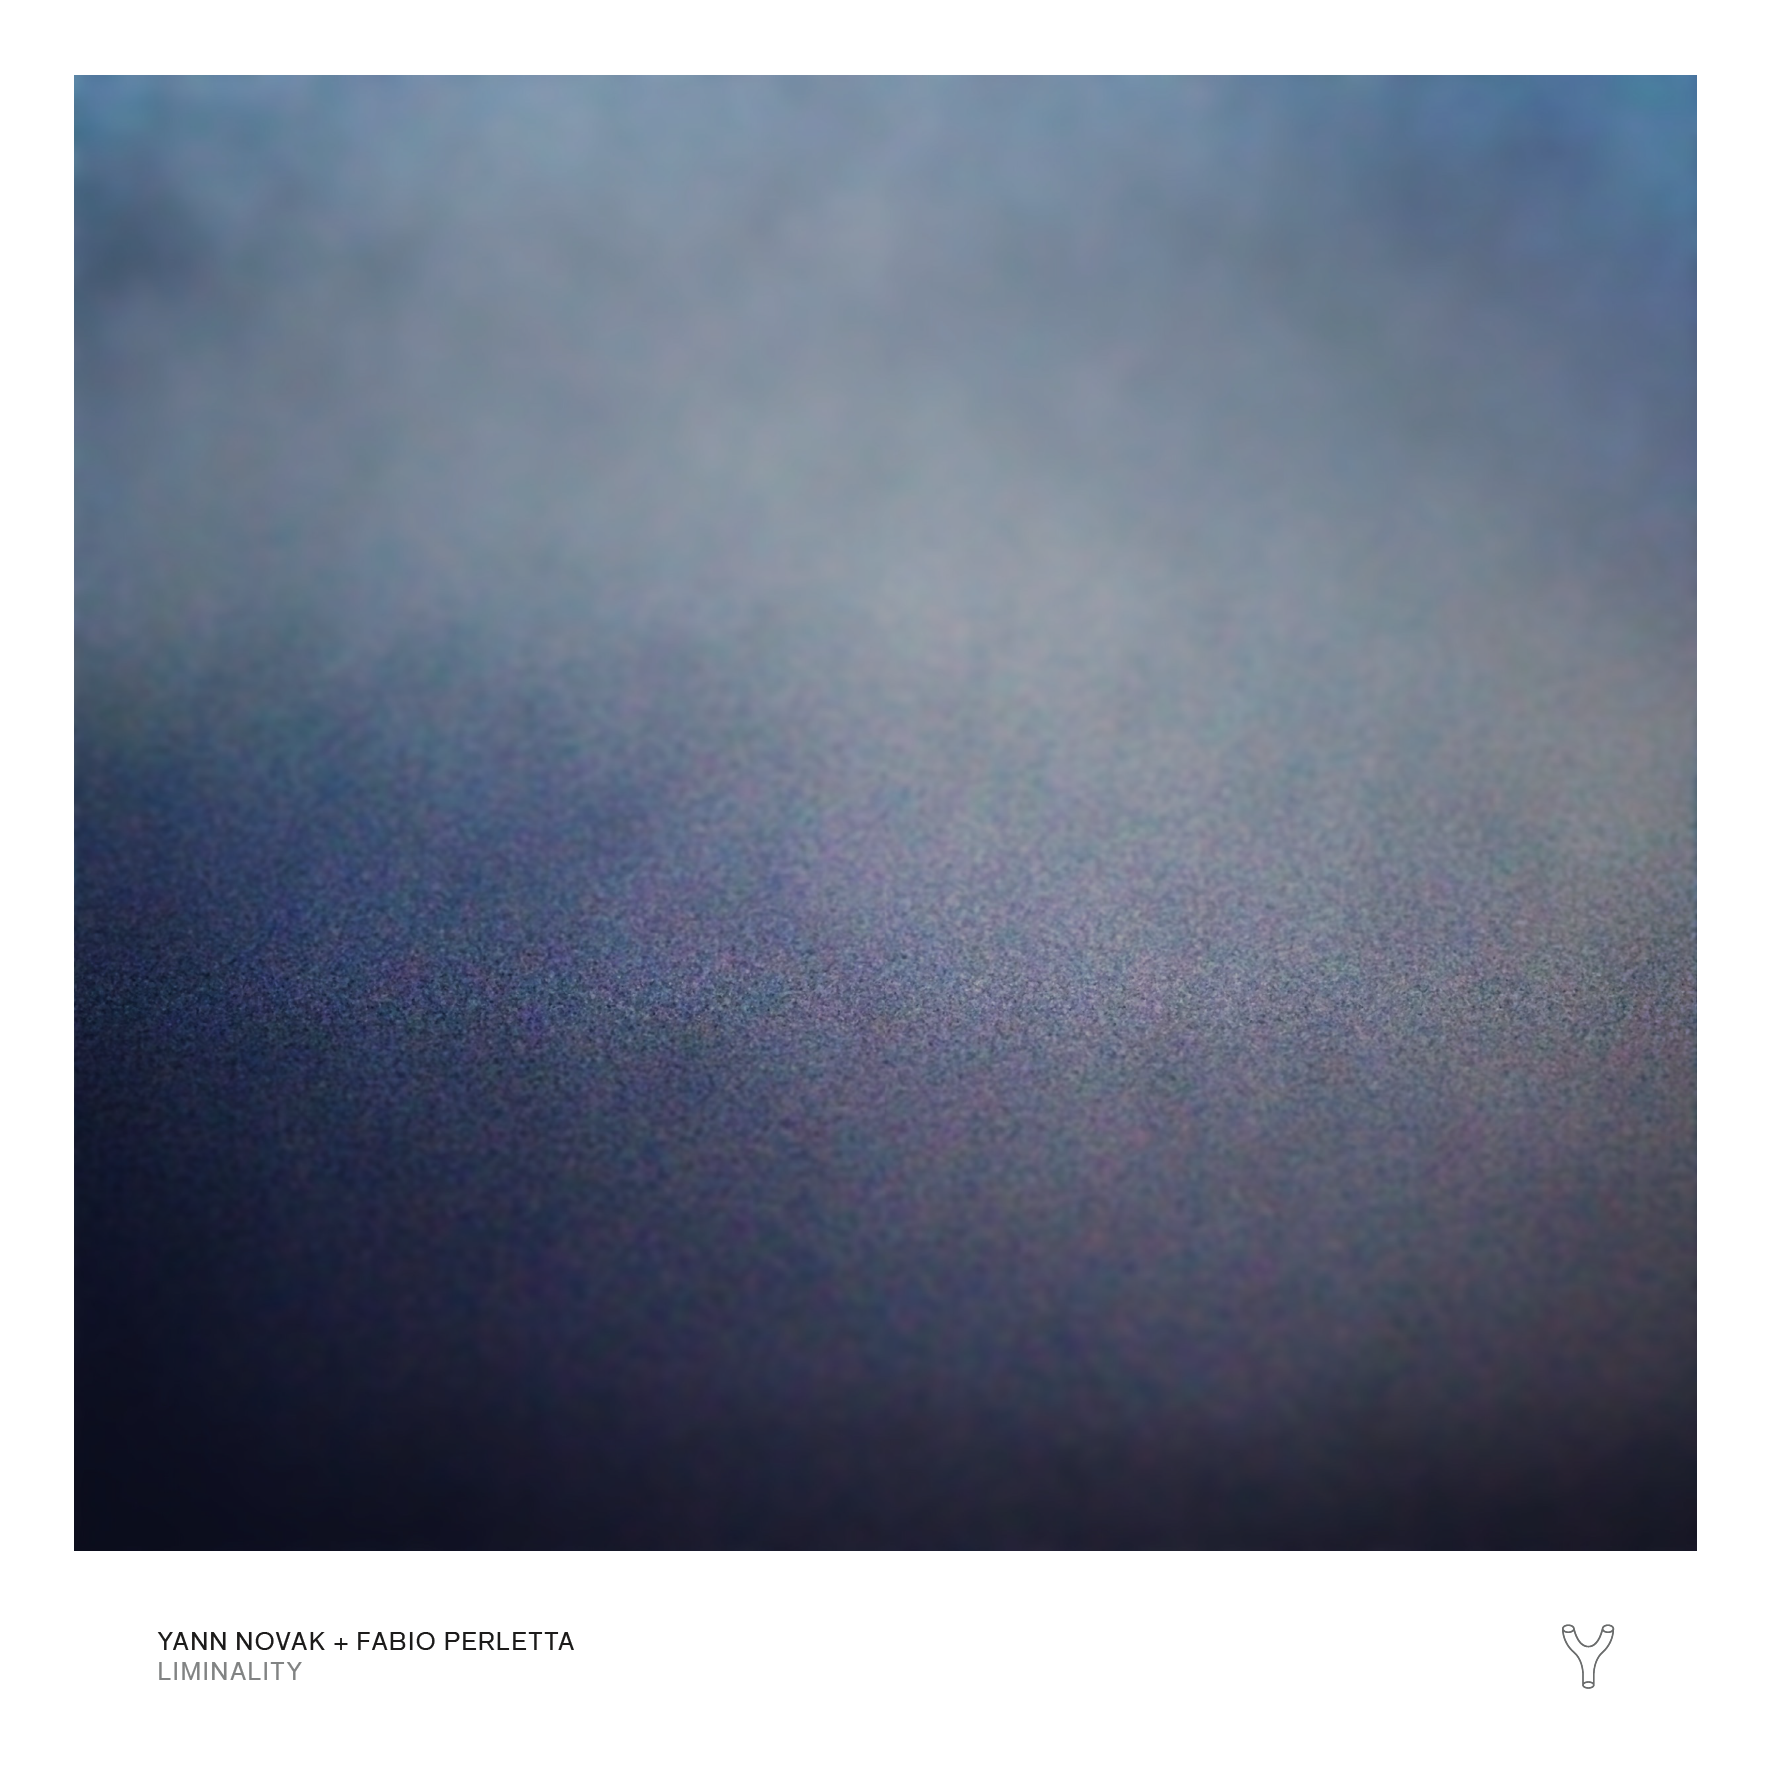 Yann Novak + Fabio Perletta — Liminality